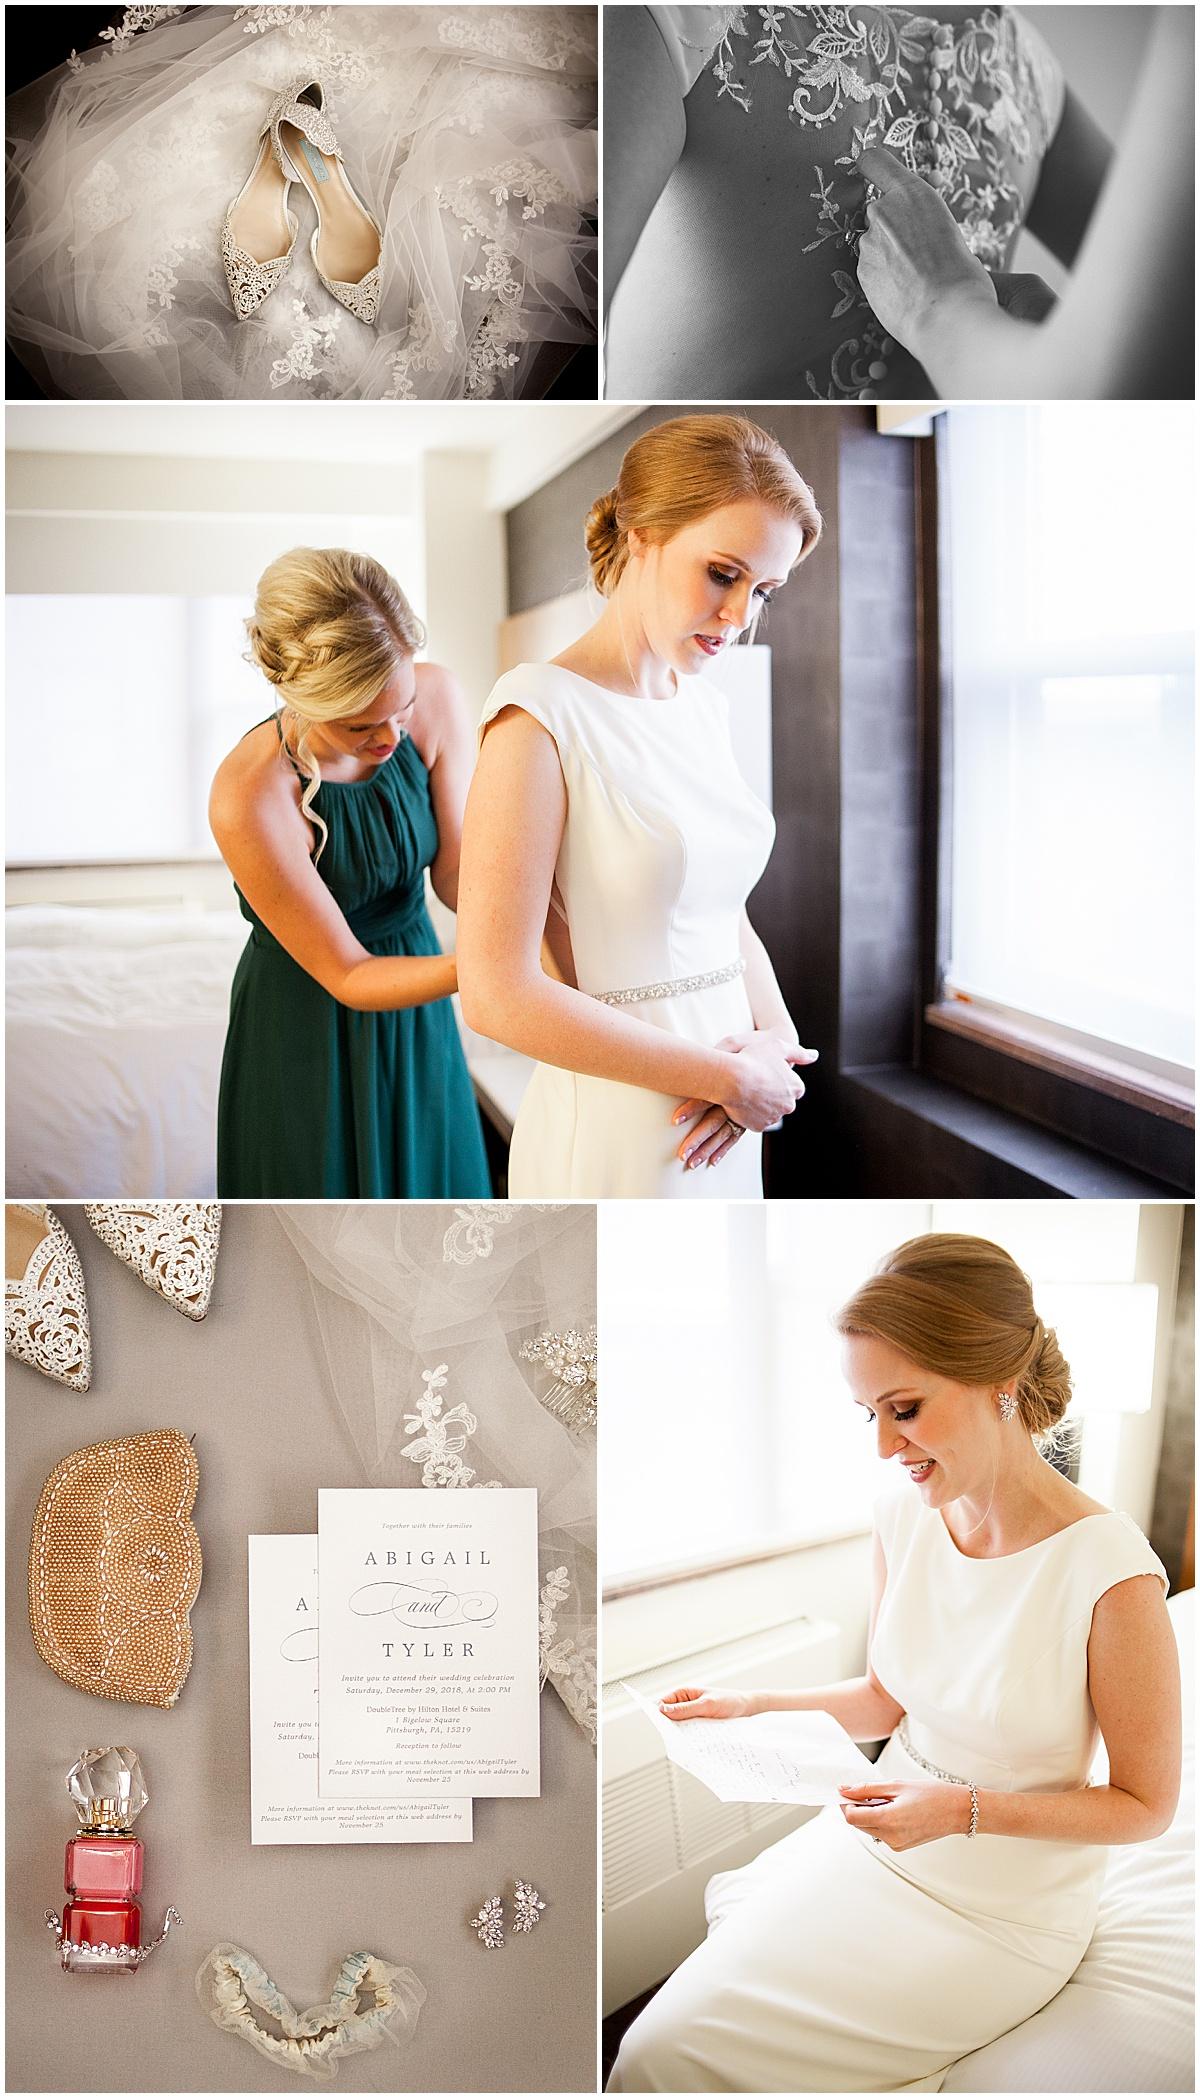 bride putting on wedding dress pittsburgh pa